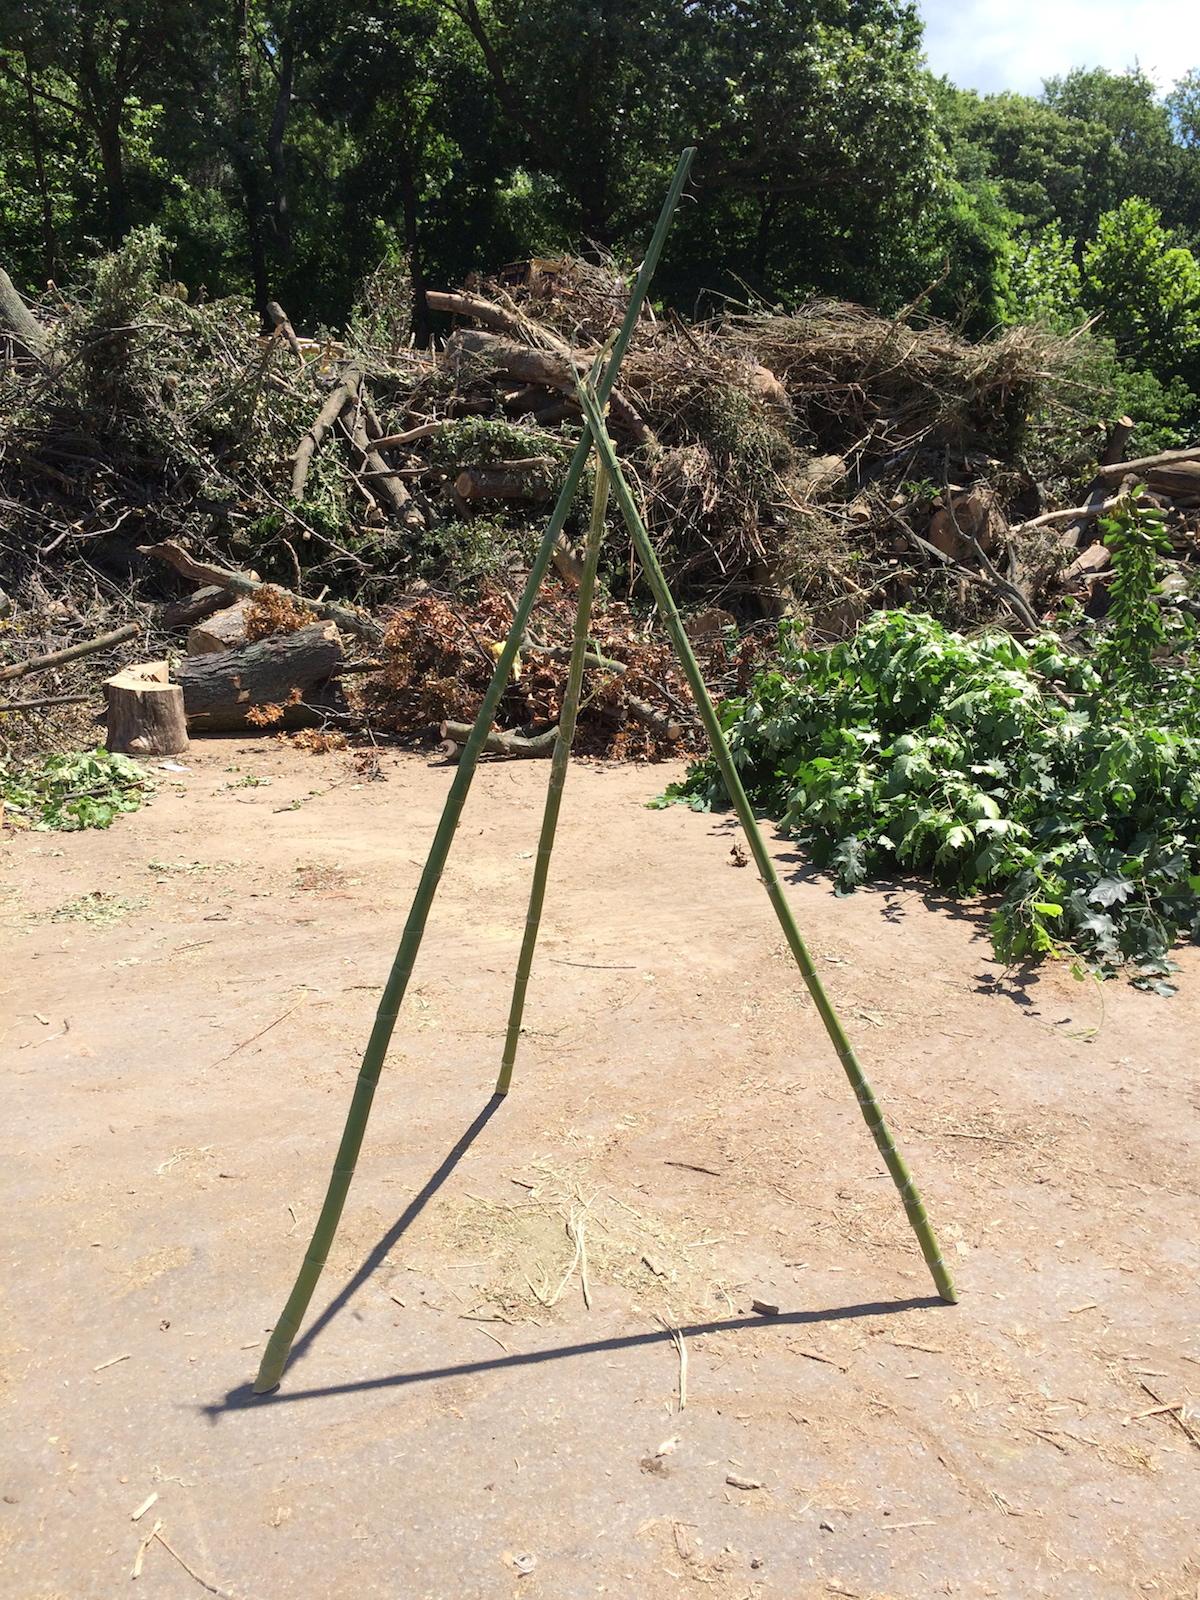 TreeAlphaStudy.Bamboo3Legs2Shadows.July2015.jpg